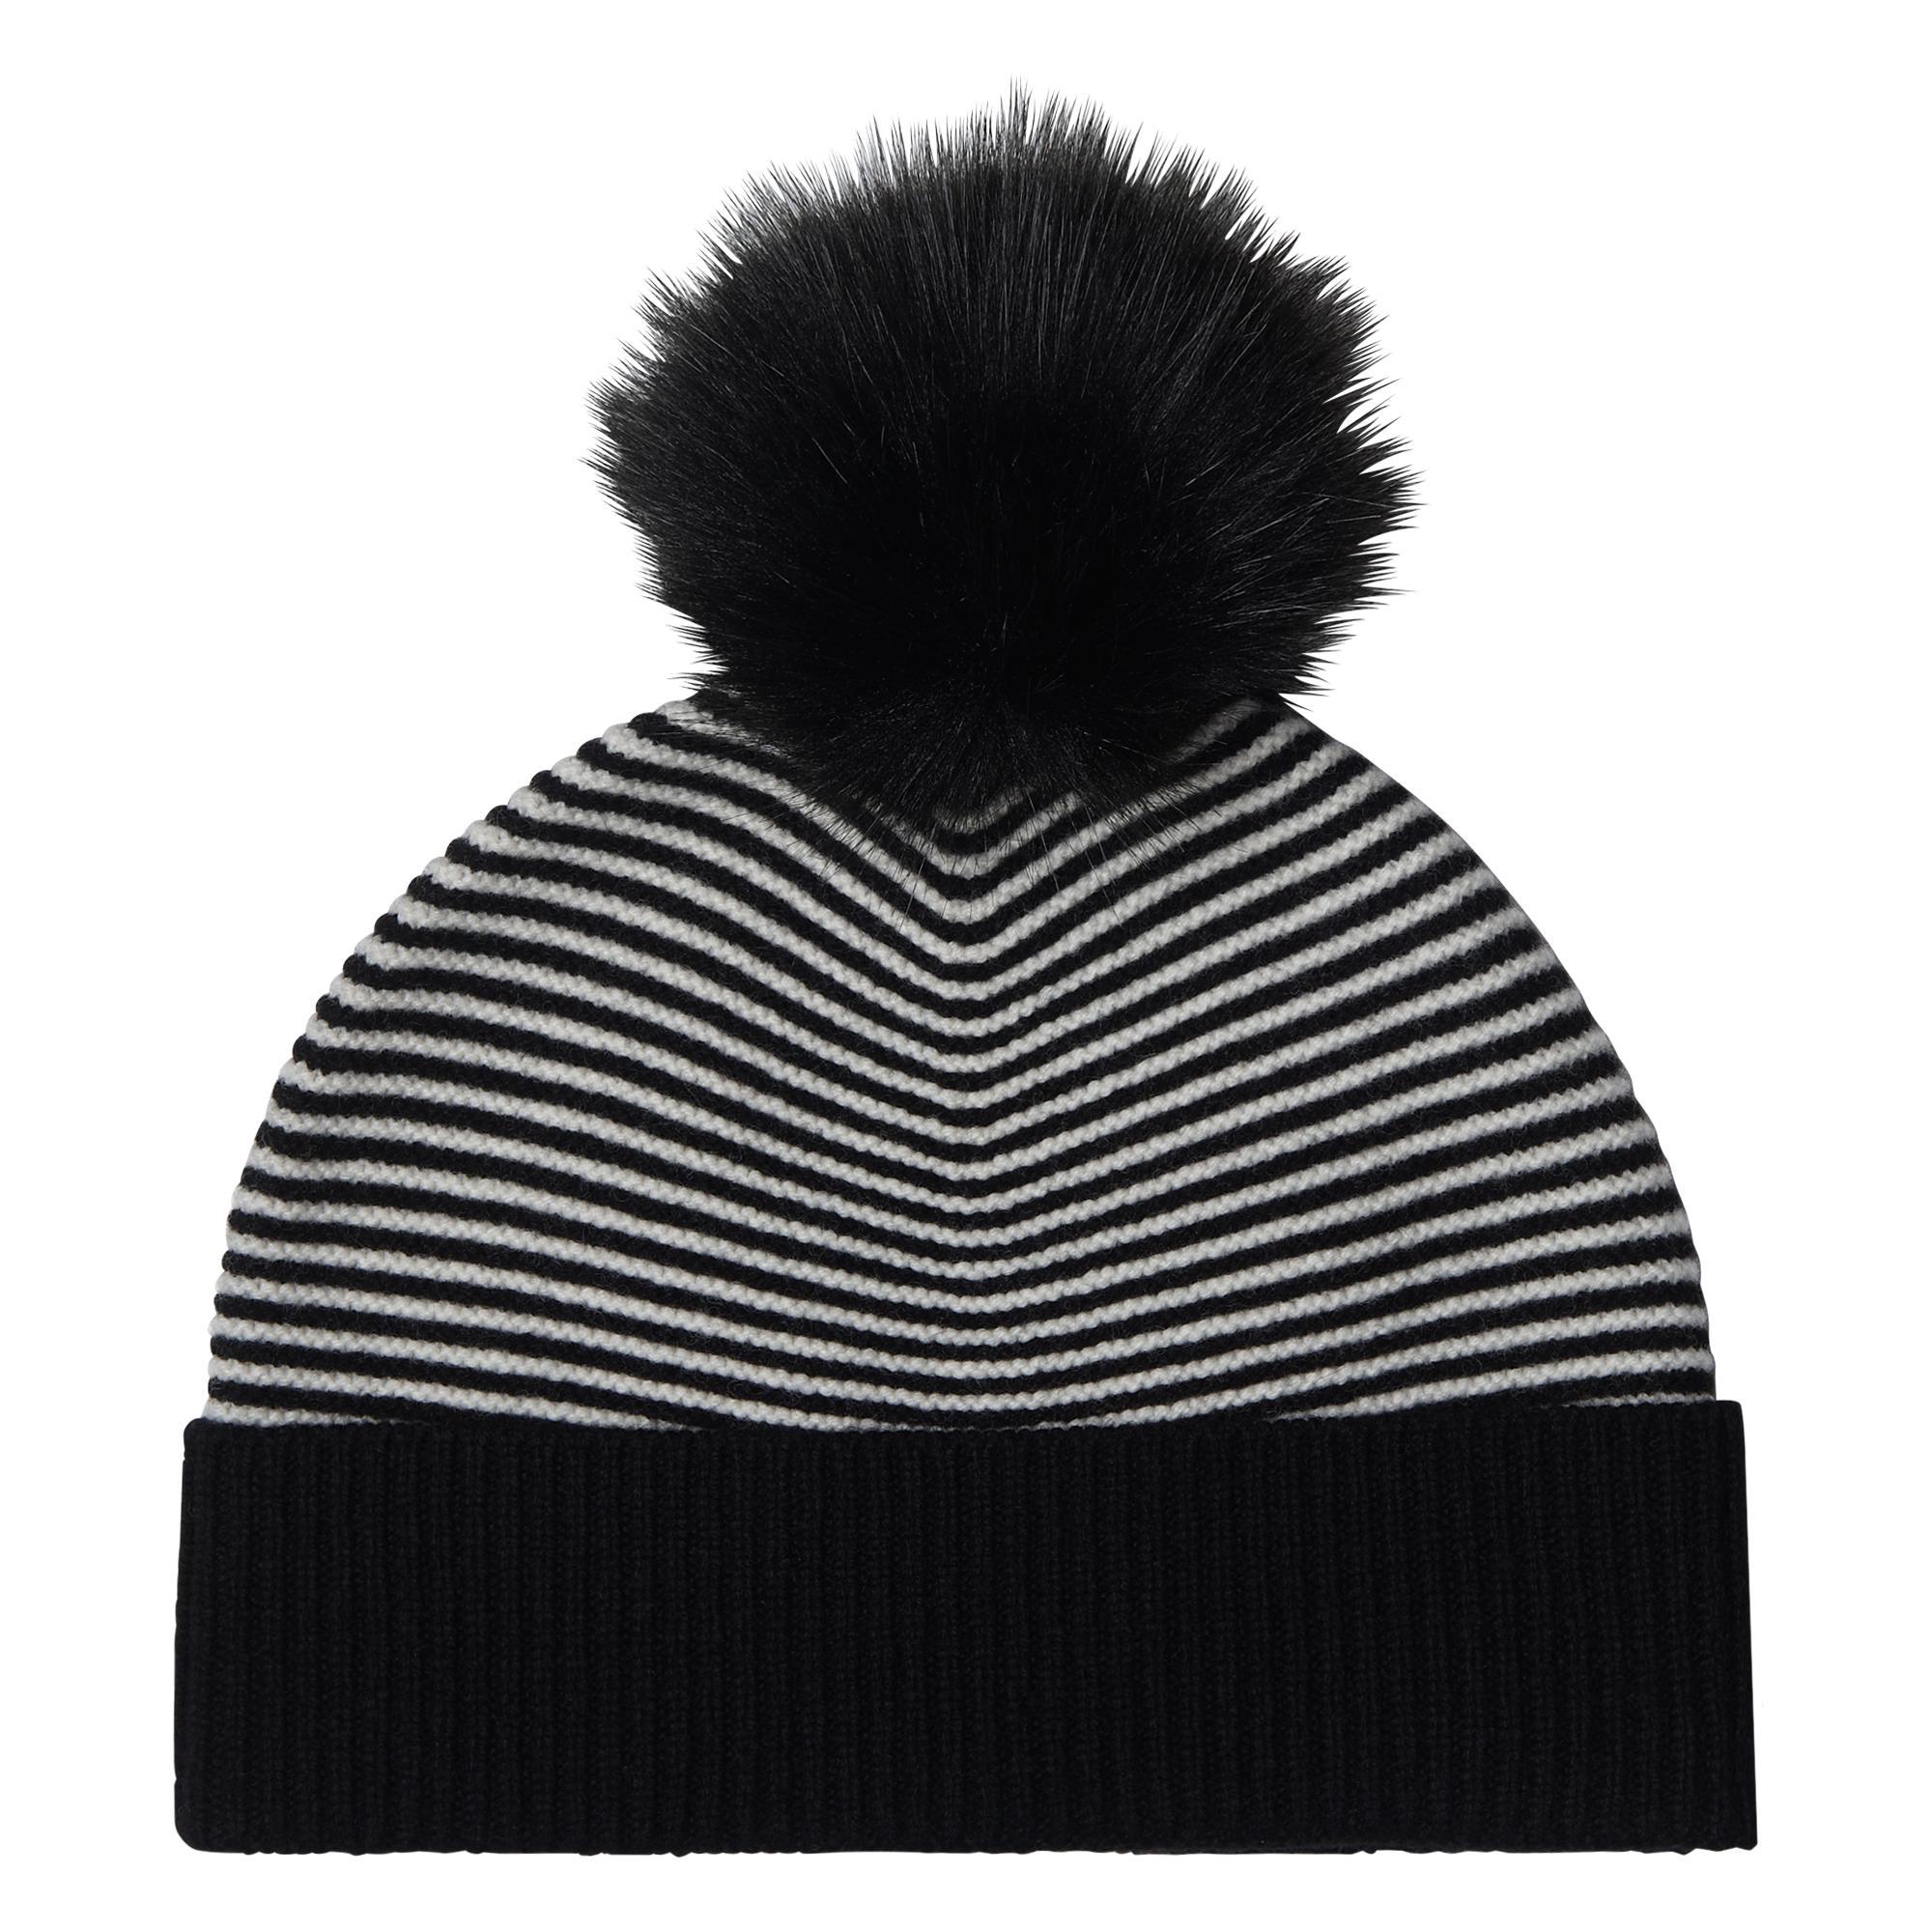 Tone Hat